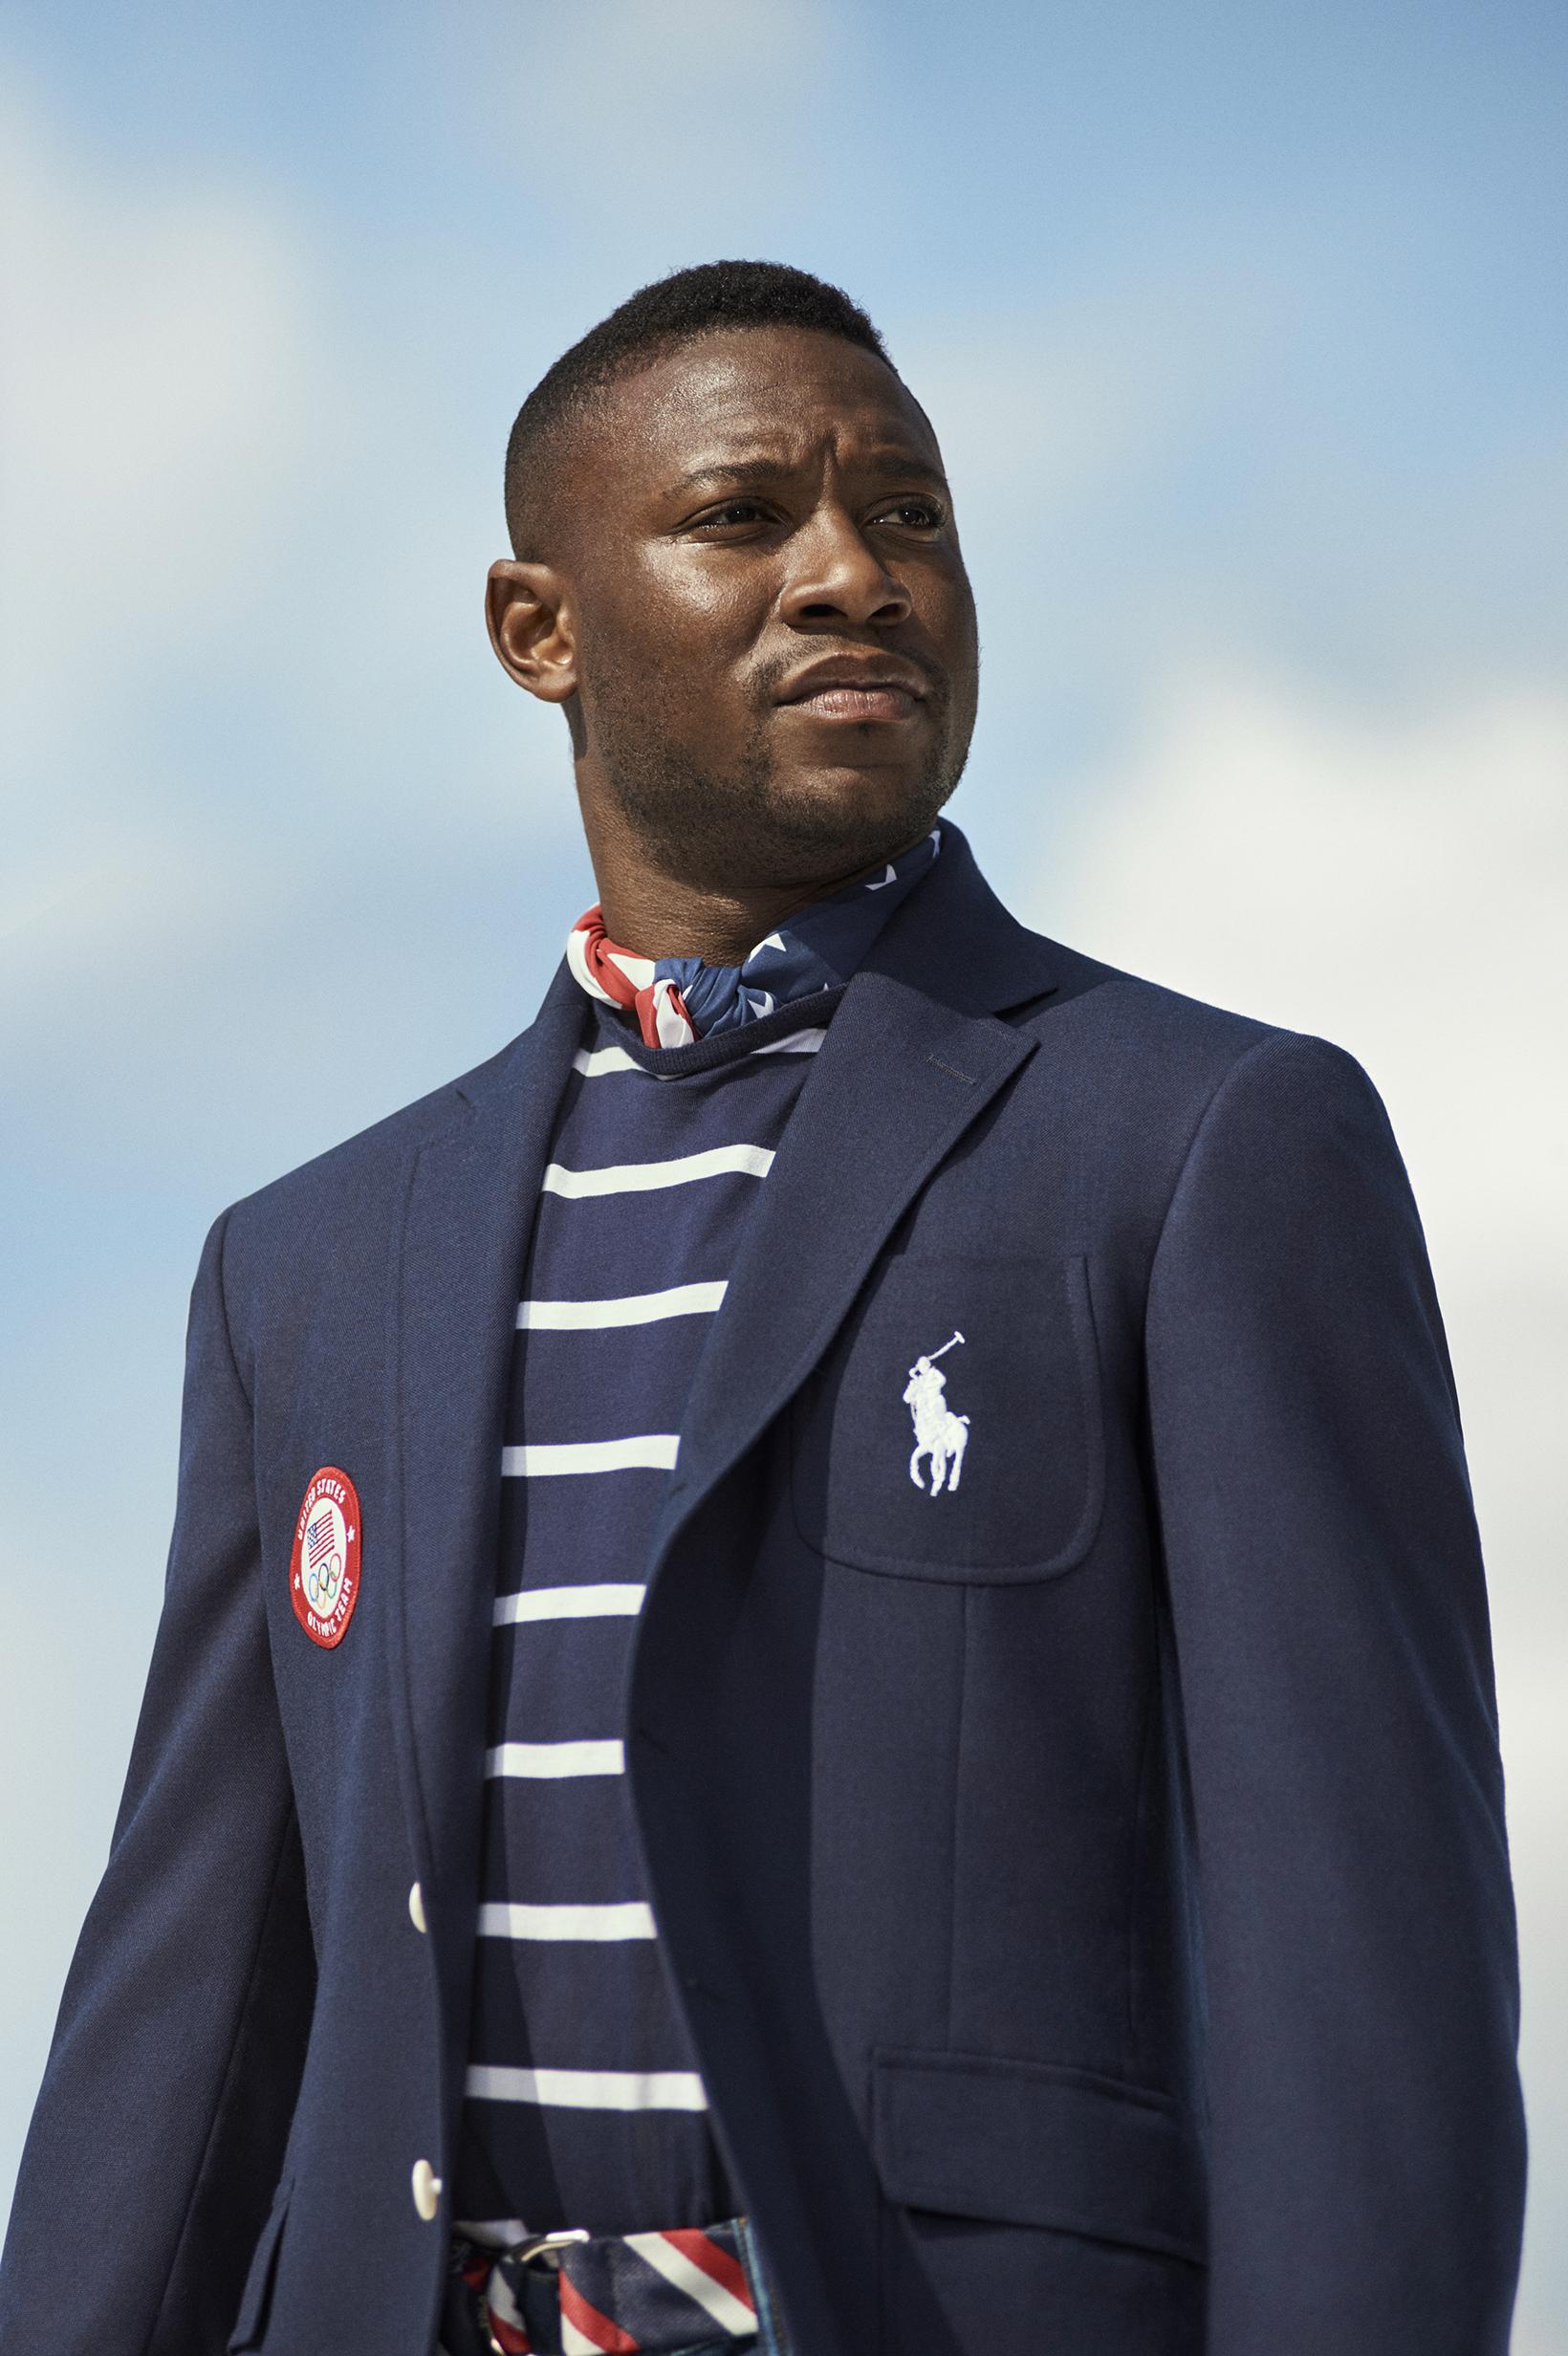 Fencer Daryl Homer in Ralph Lauren's Olympic uniform.